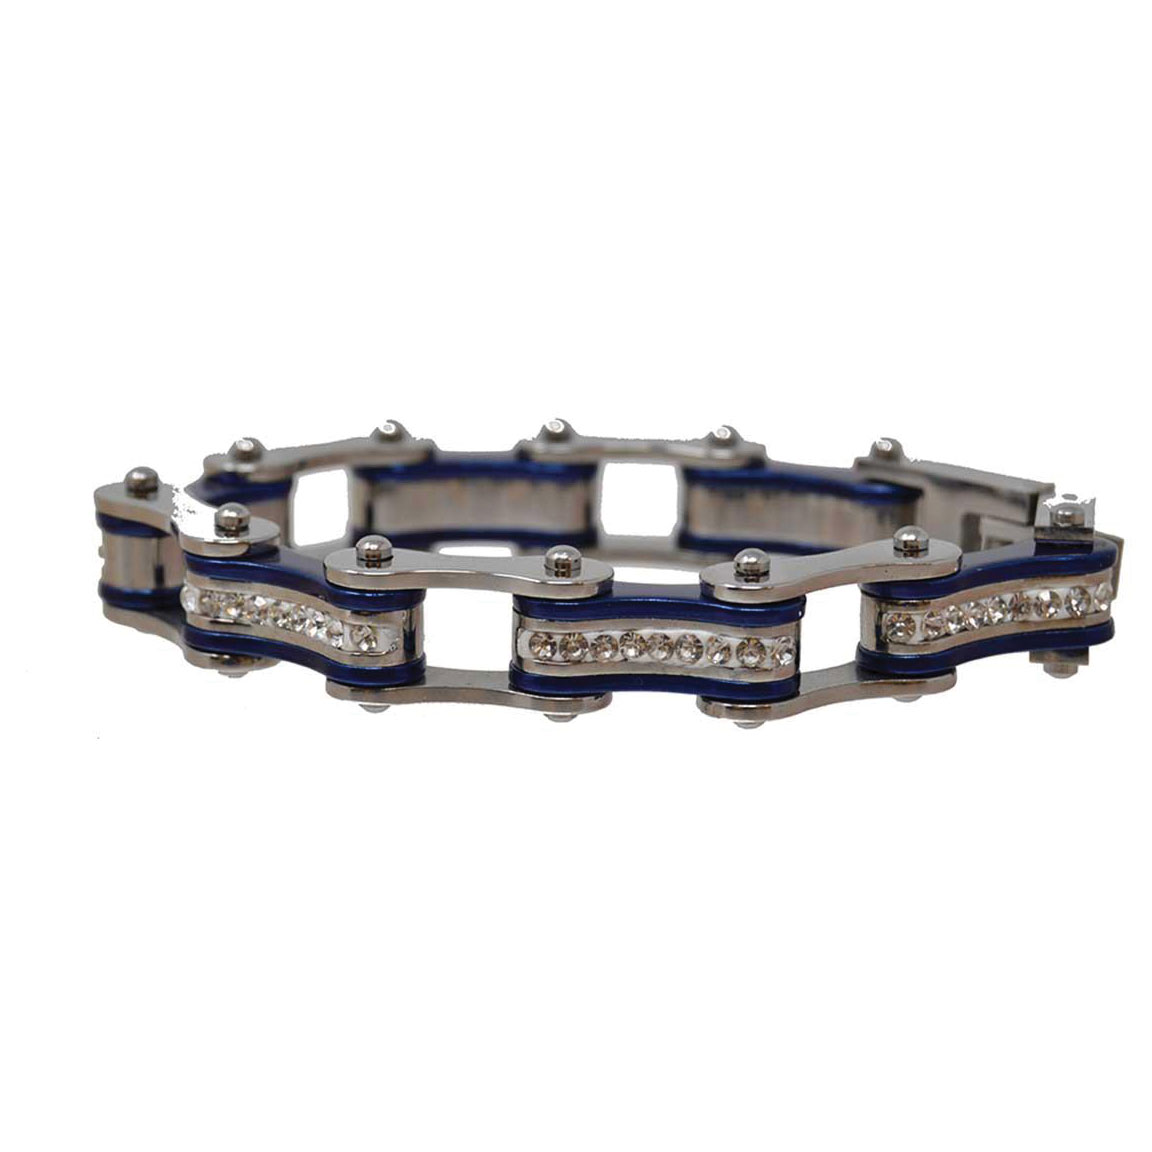 Vance Leathers Silver/Dark Blue Bracelet with Crystal Links